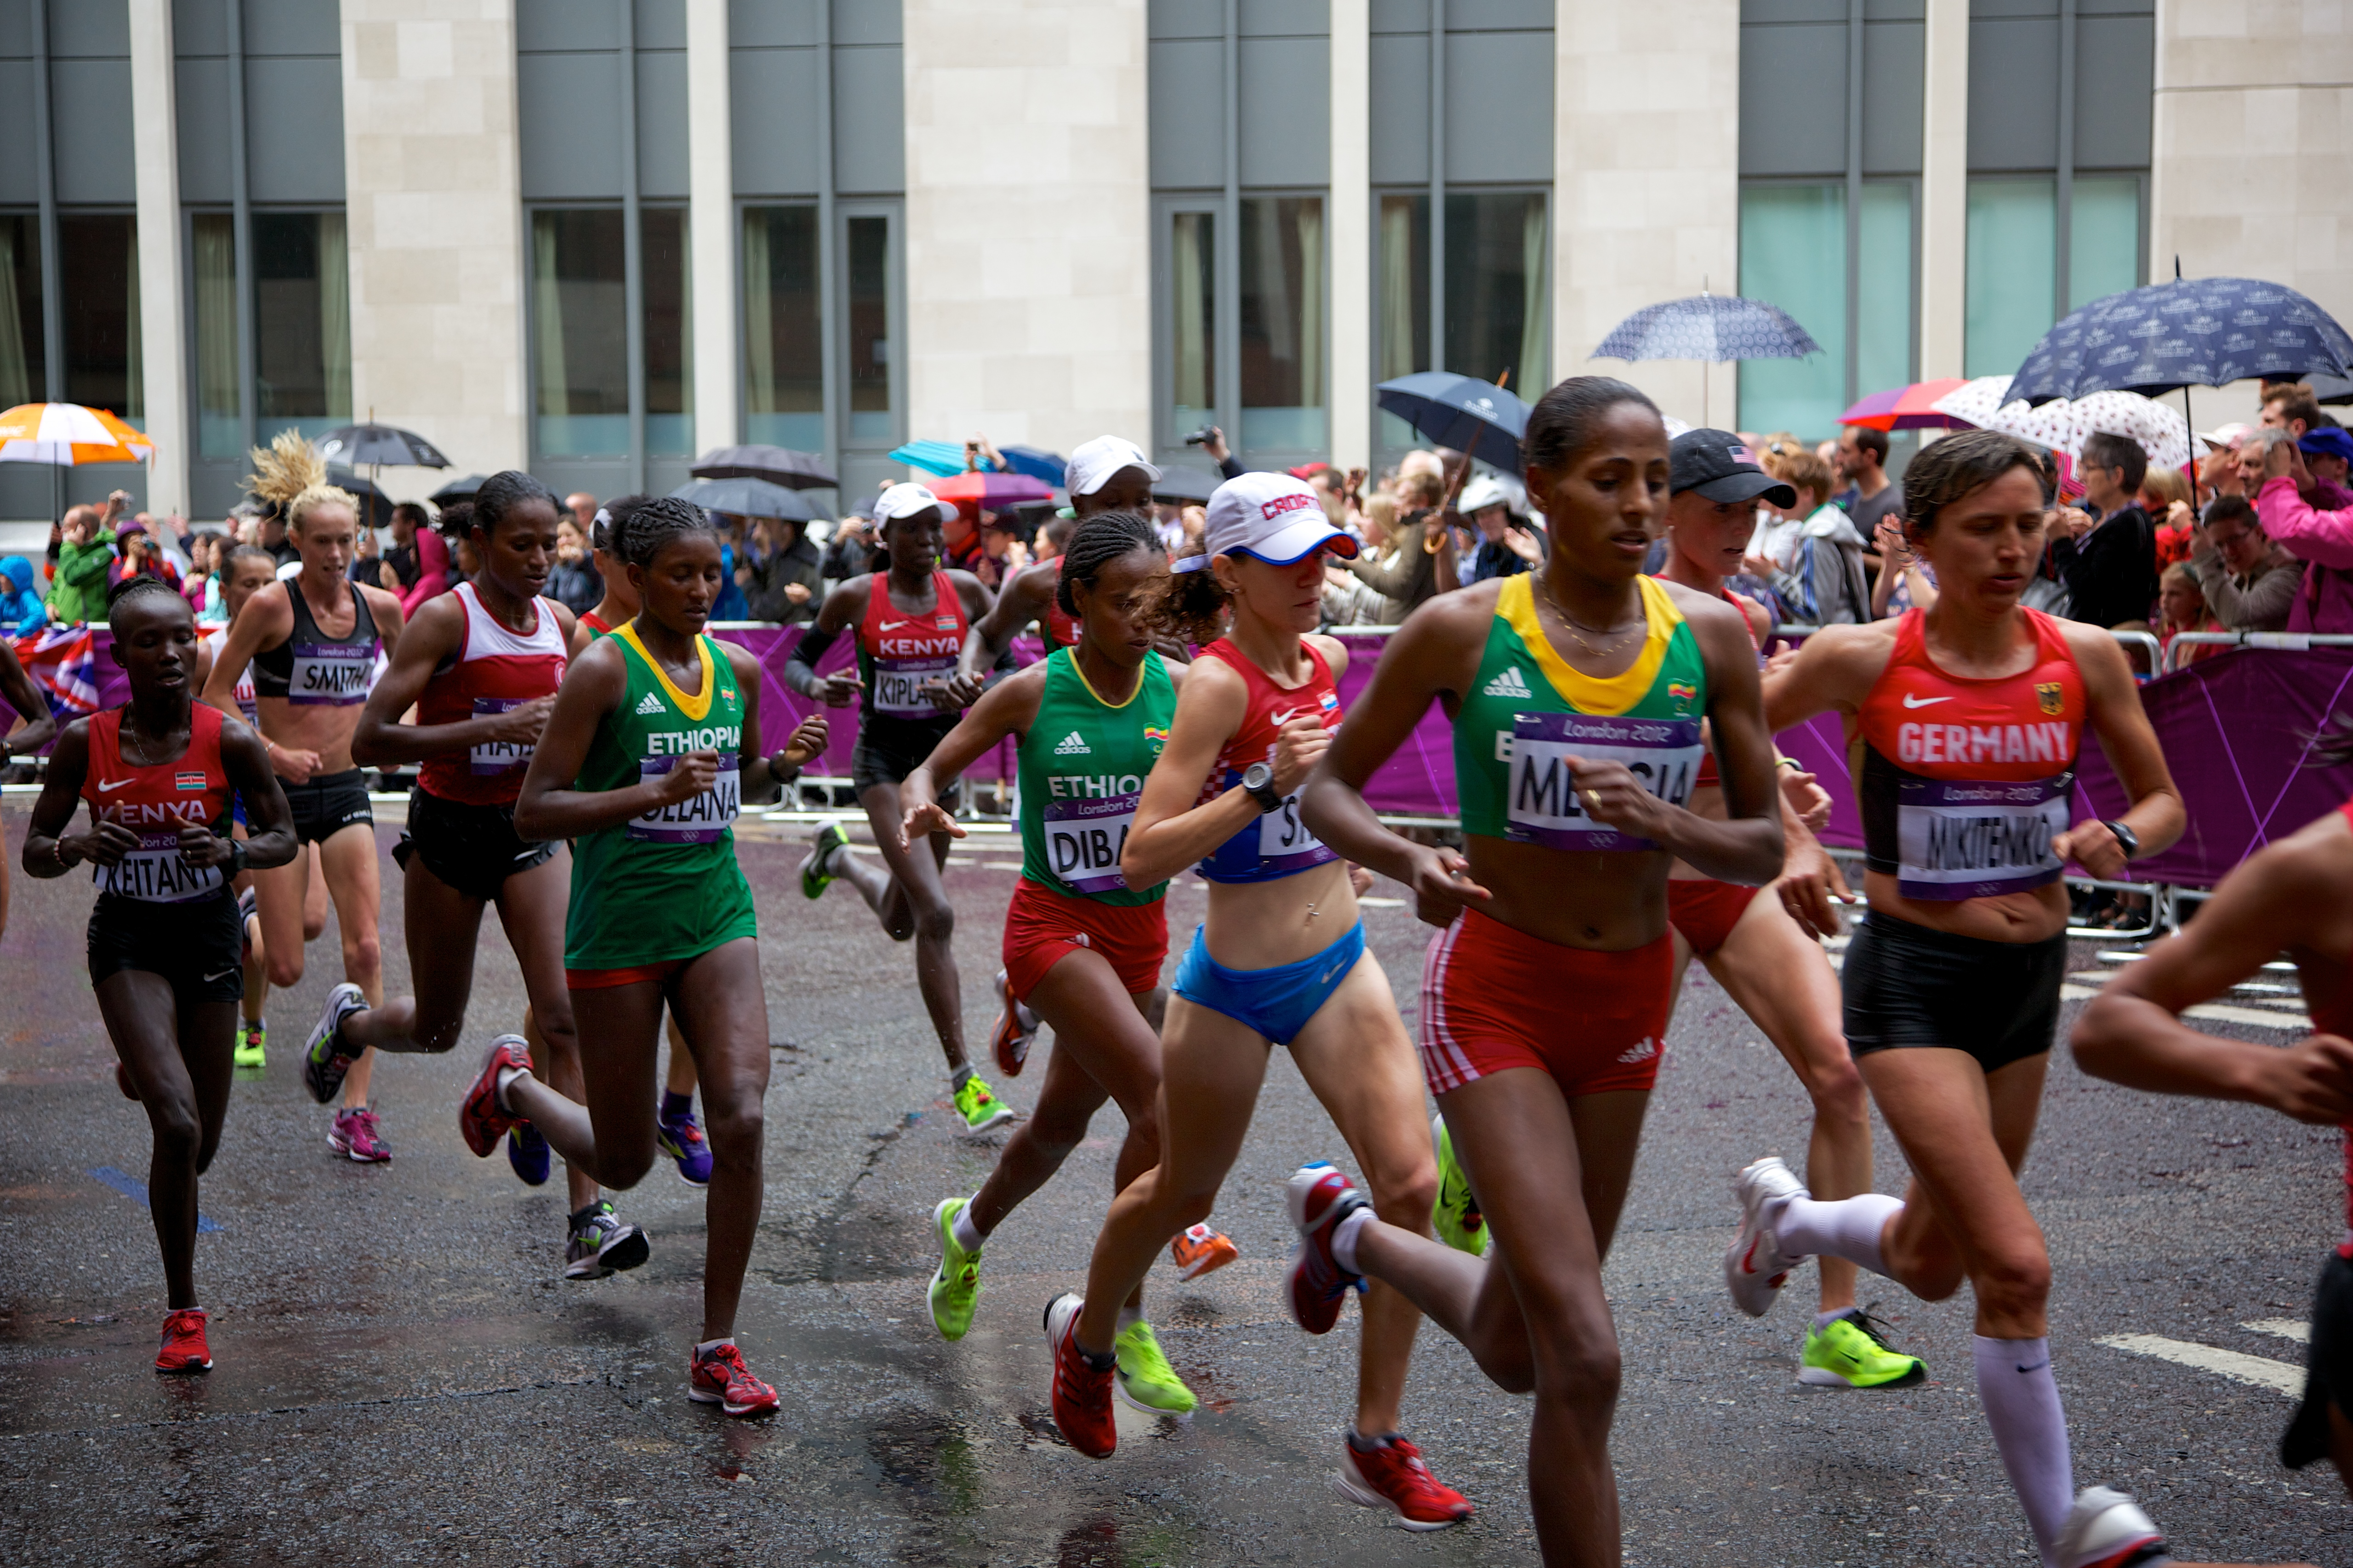 Description Women's Marathon London 2012 006.jpg